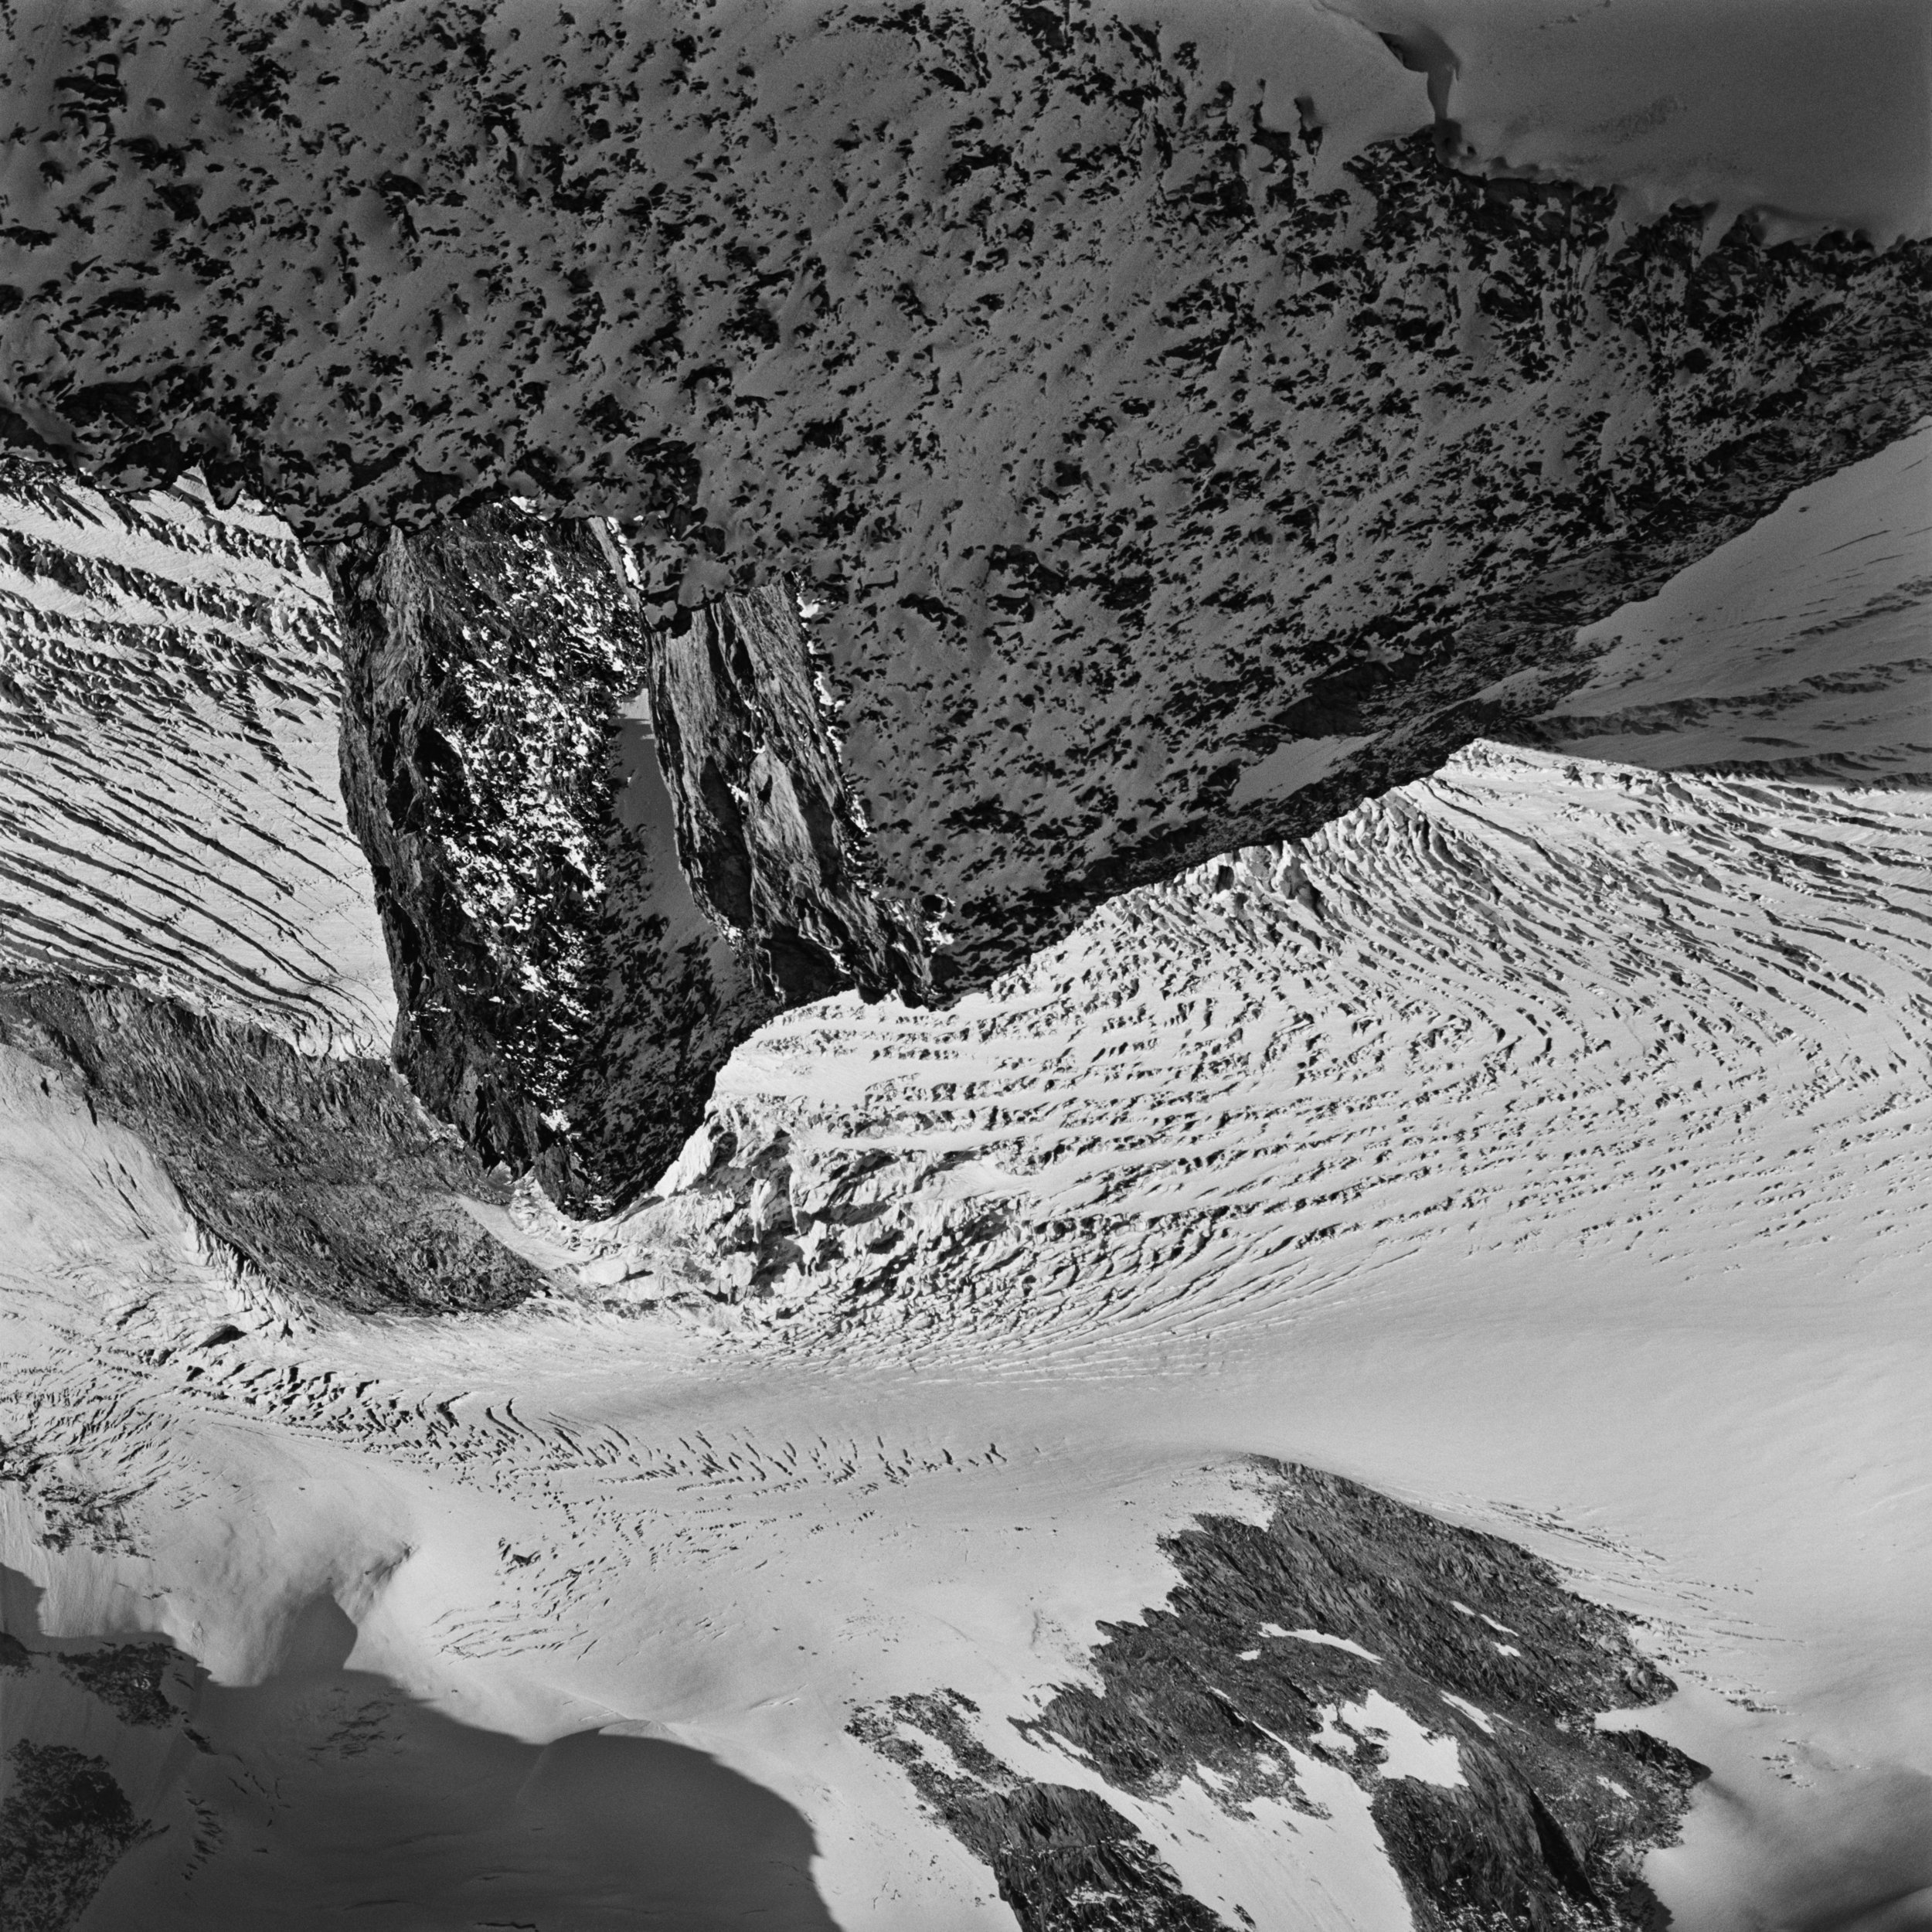 Vertigo. Galmiggletscher, Wallis, 19.10.2014